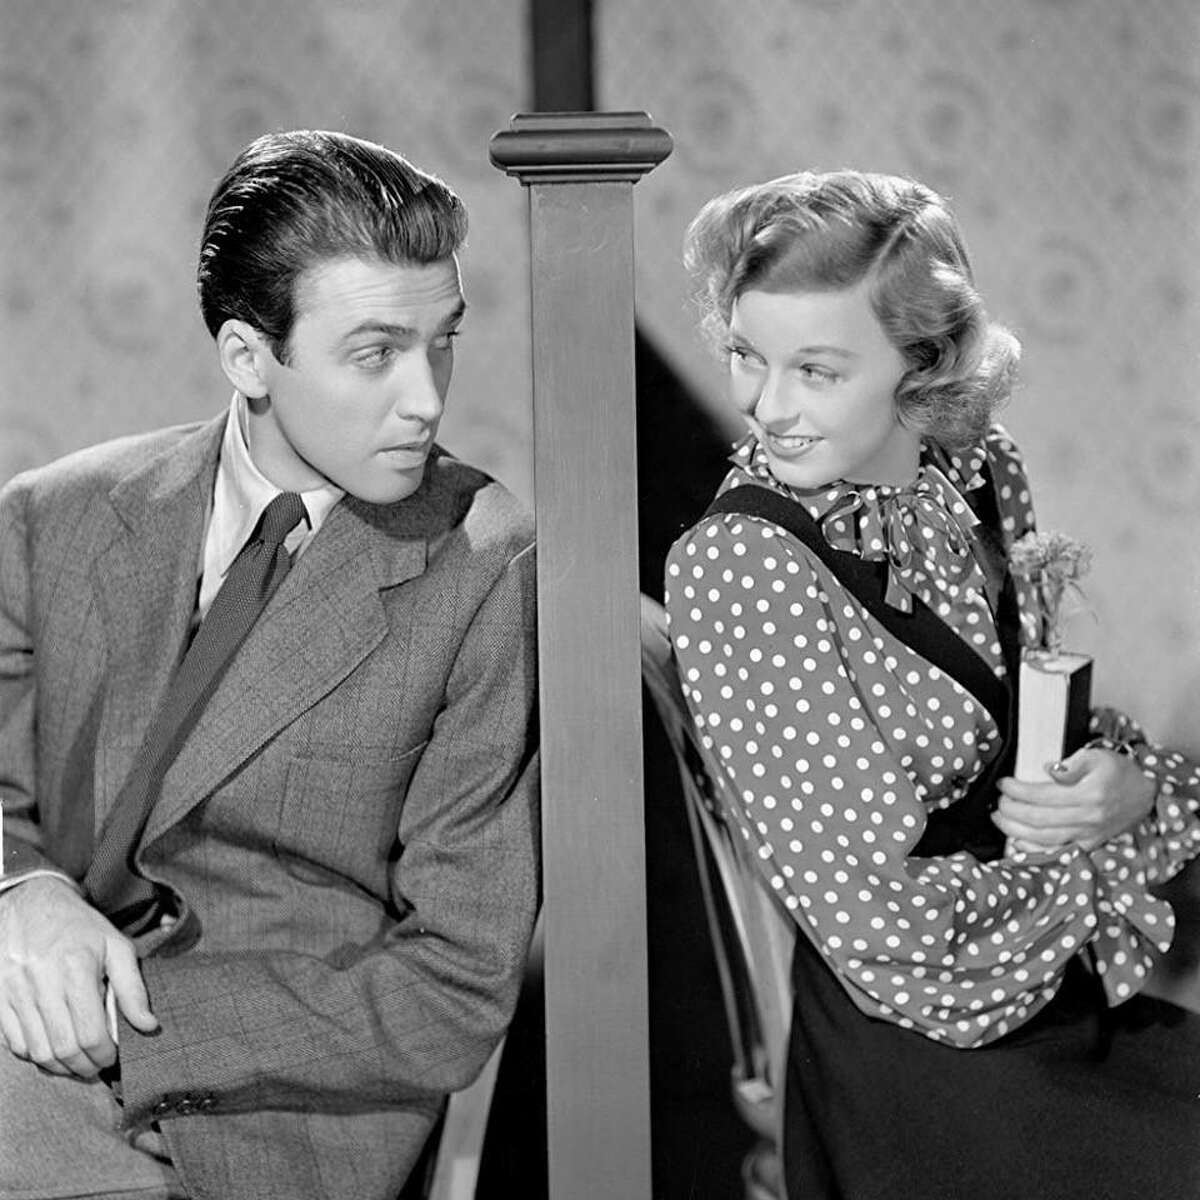 James Stewart and Margaret Sullavan star in the 1940 film